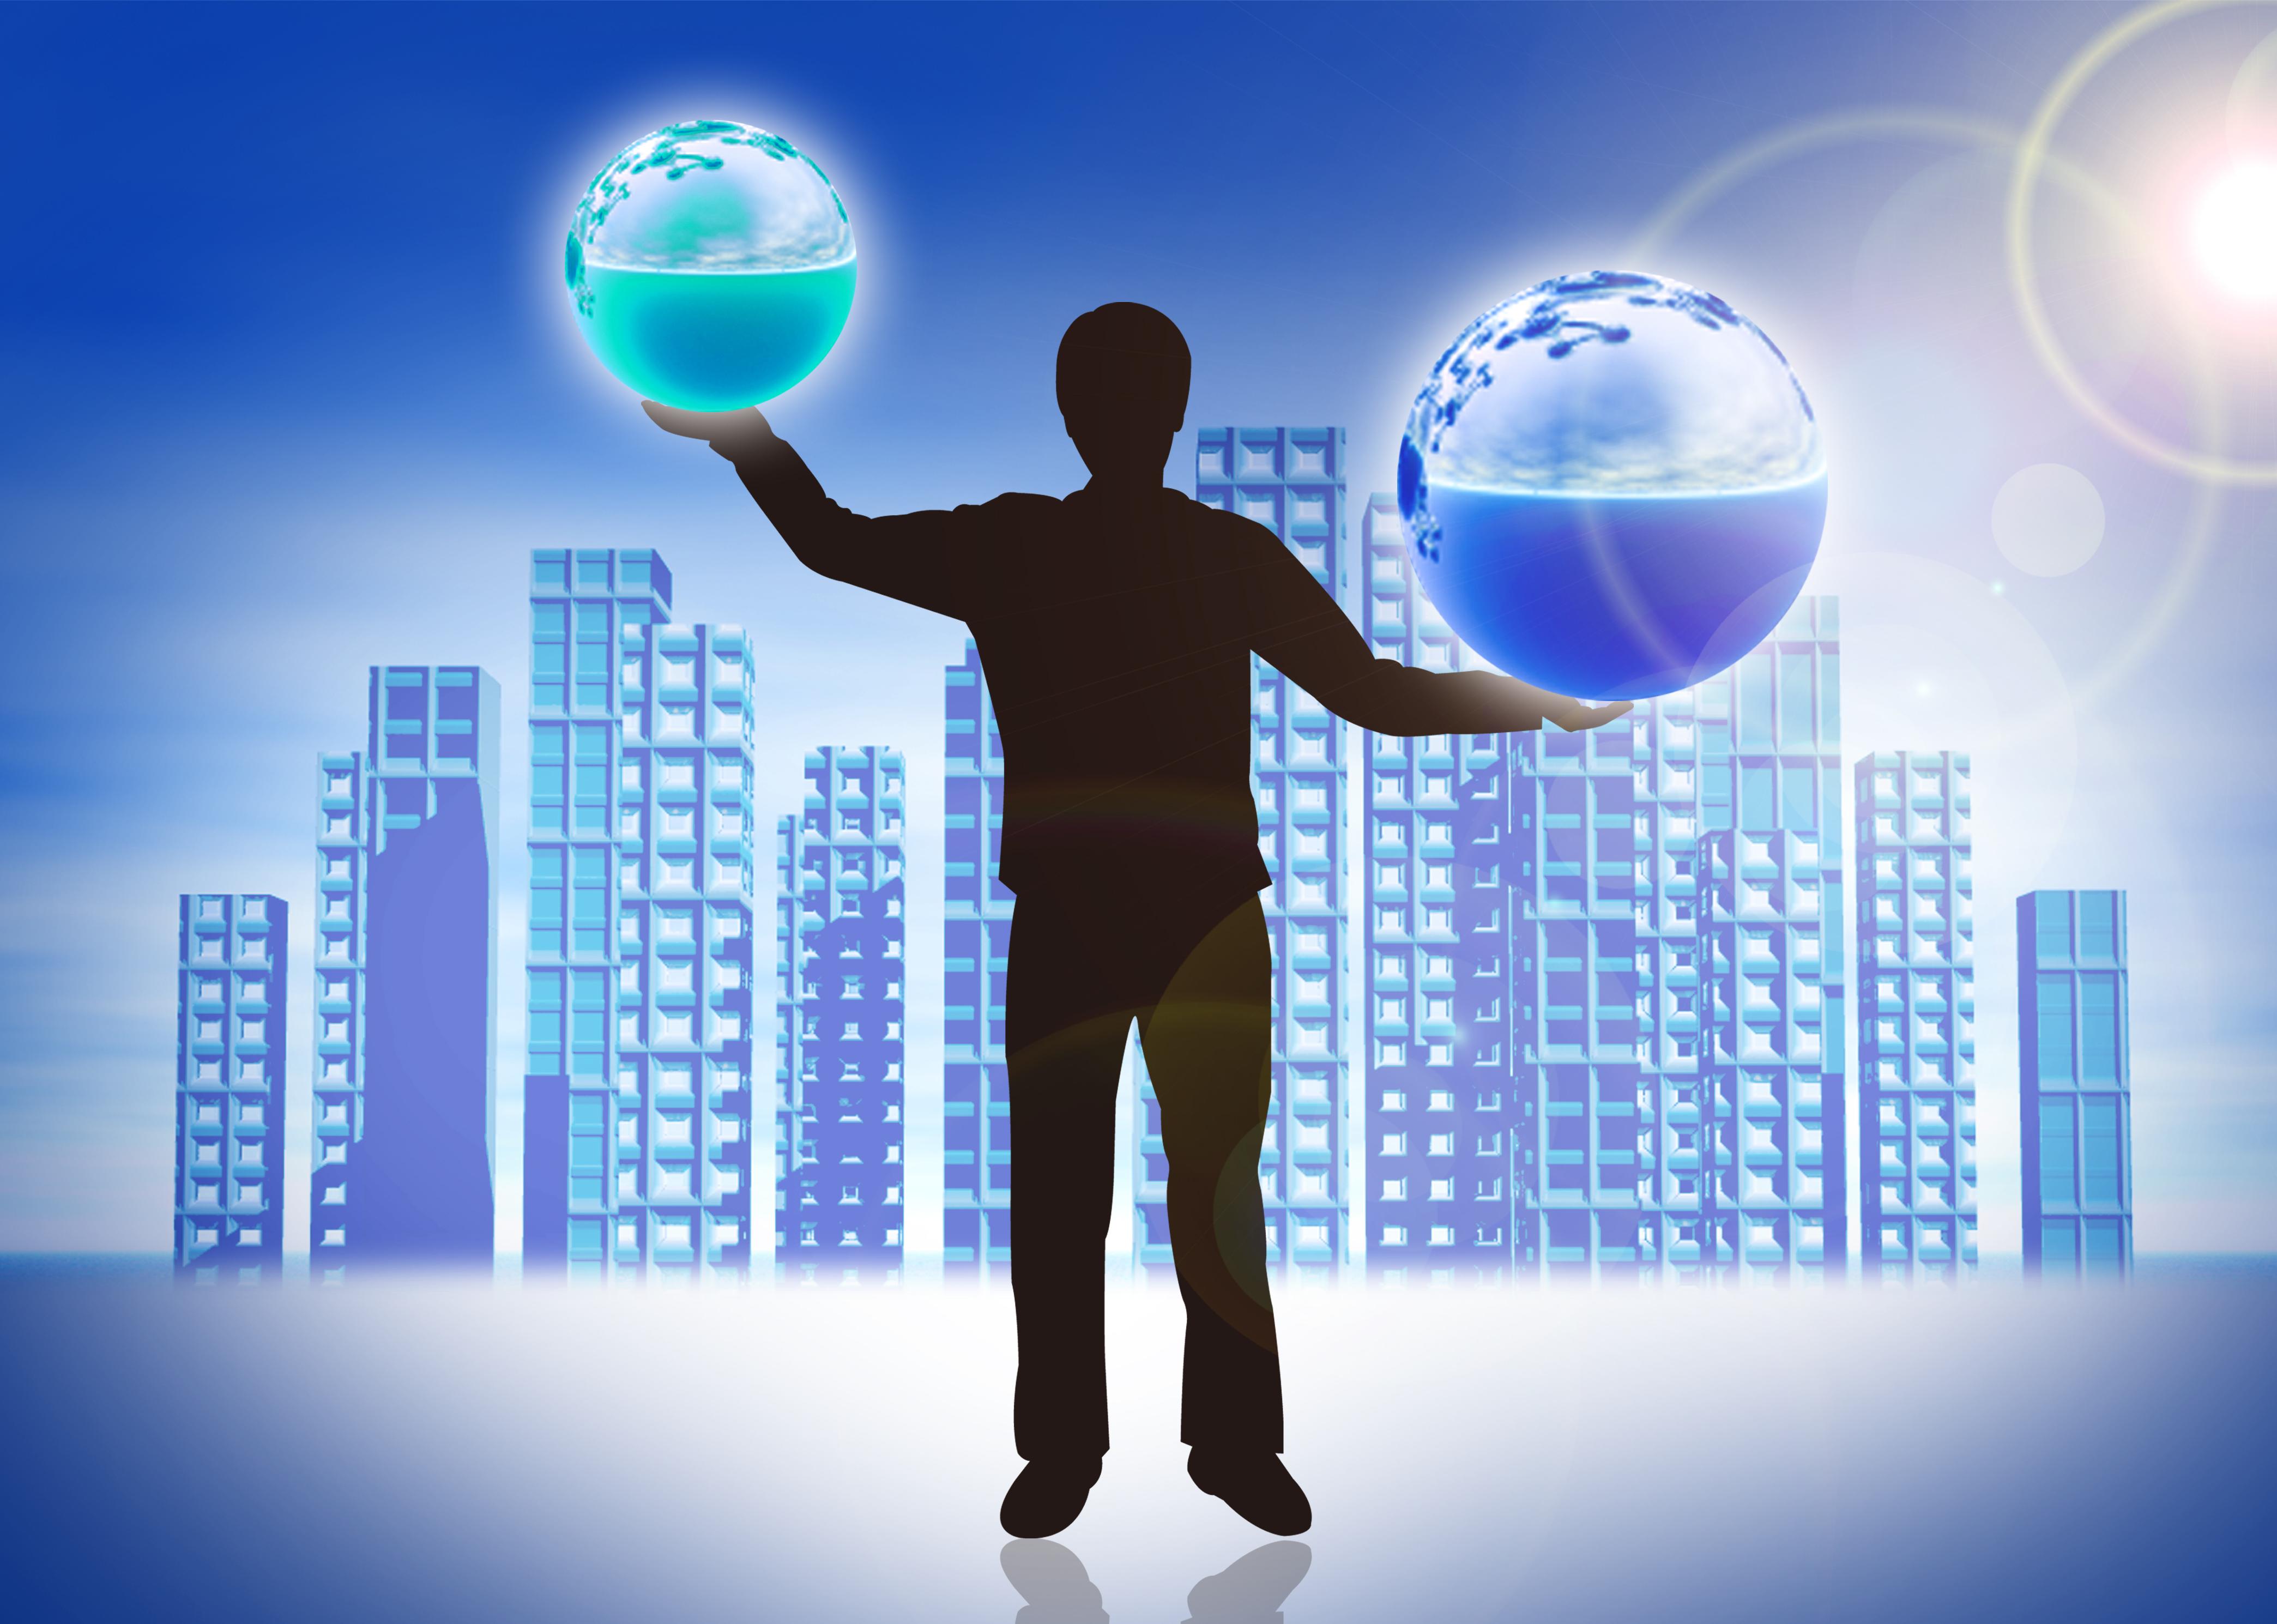 【M&Aインサイト】日本の子会社買収(売却)市場:上場企業間の取引の実証分析